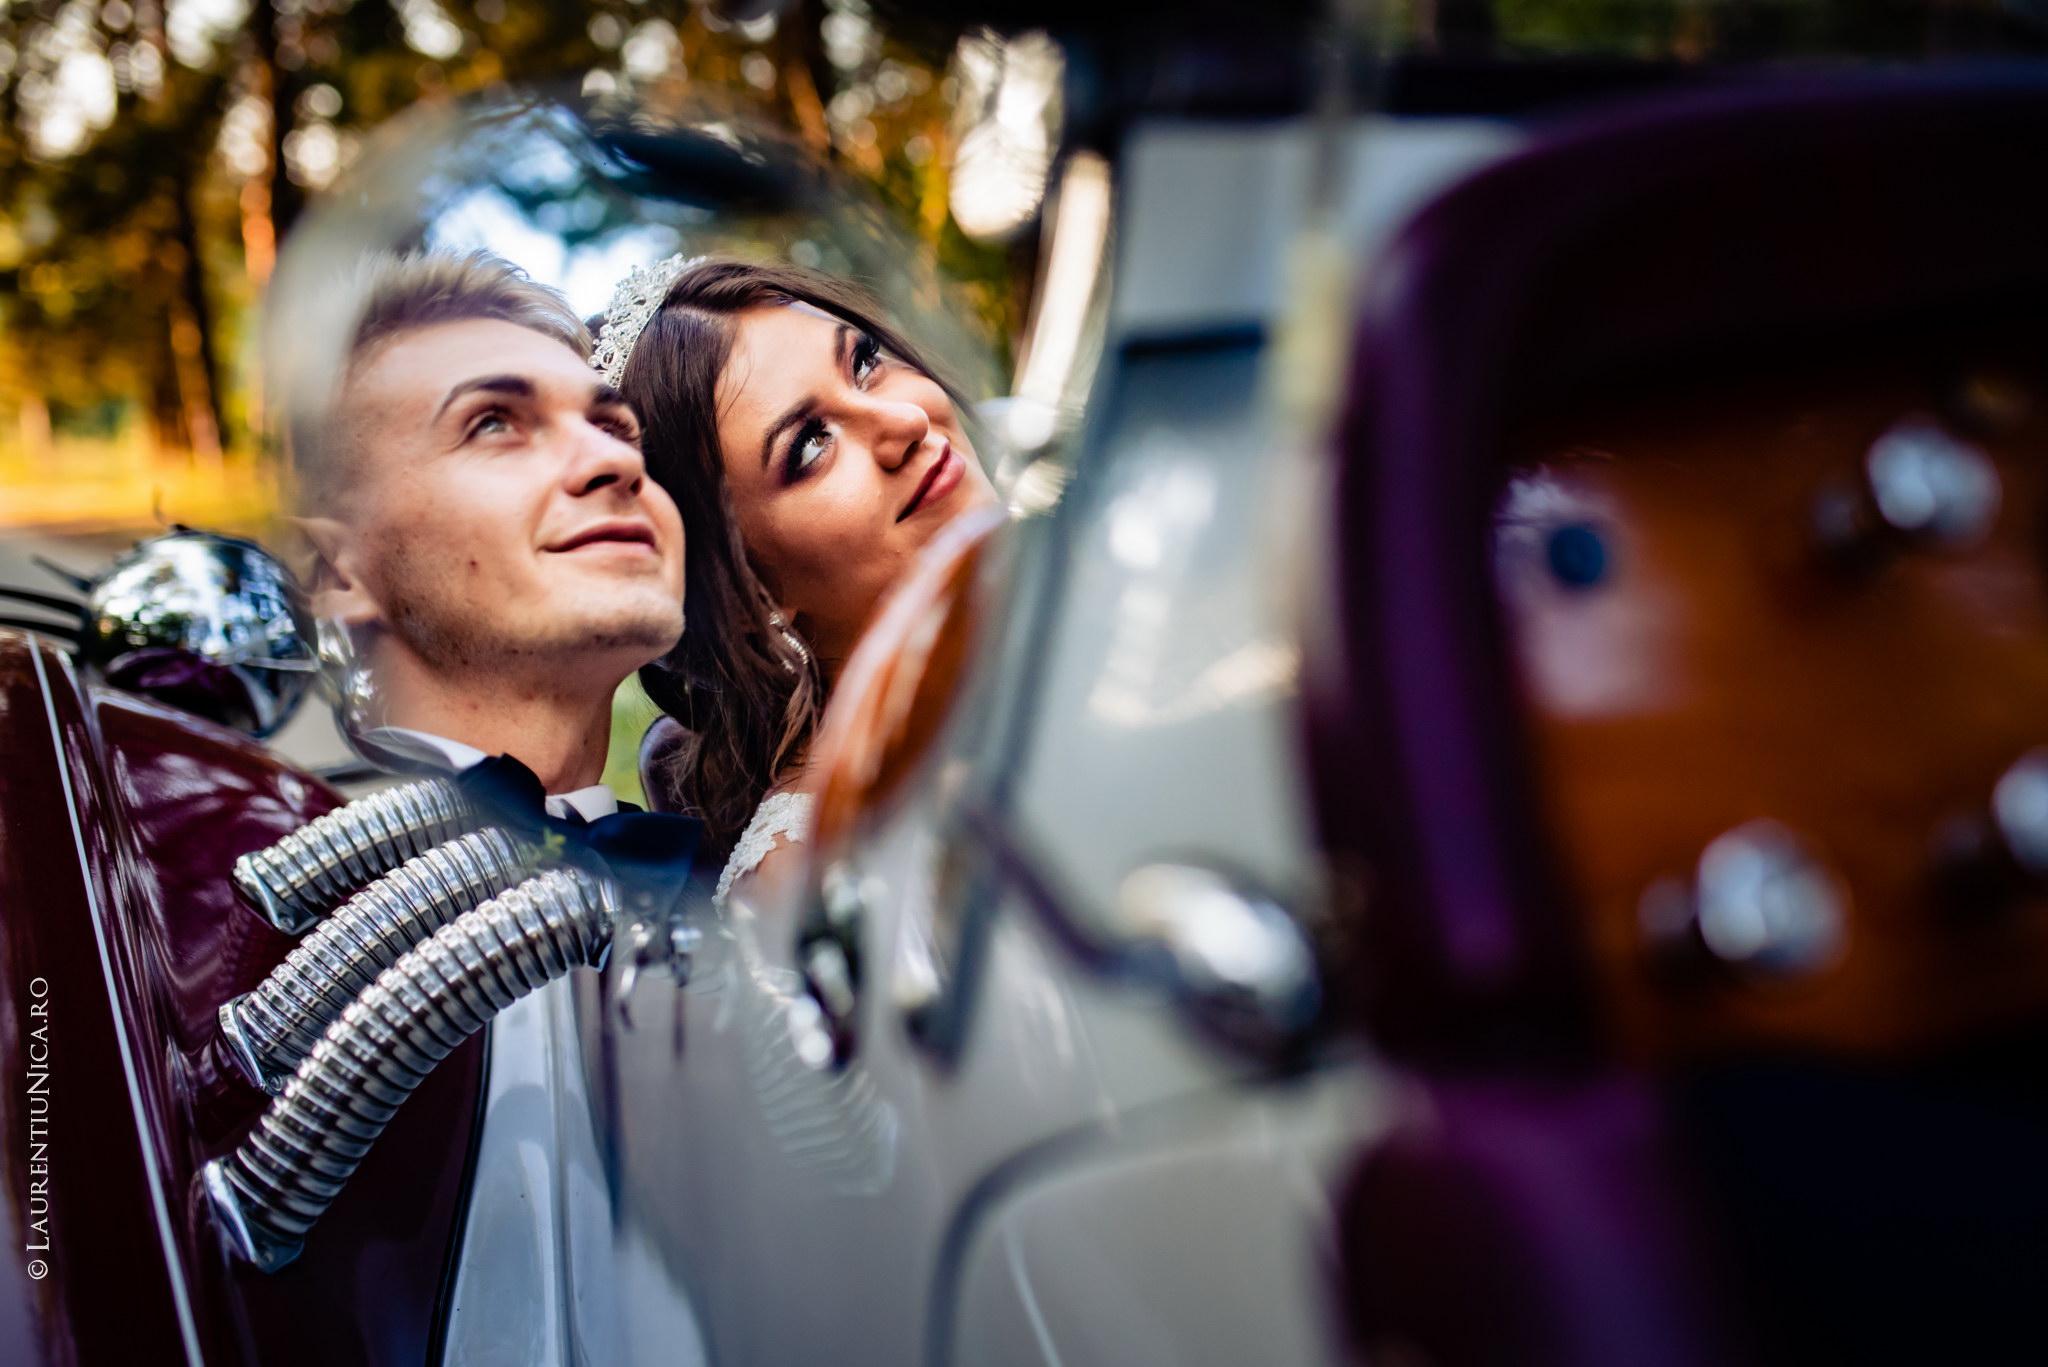 fotografii nunta Roxana si Cosmin fotograf nunta laurentiu nica 30 - Roxana & Cosmin | Fotografii nunta | Ticleni, judetul Gorj